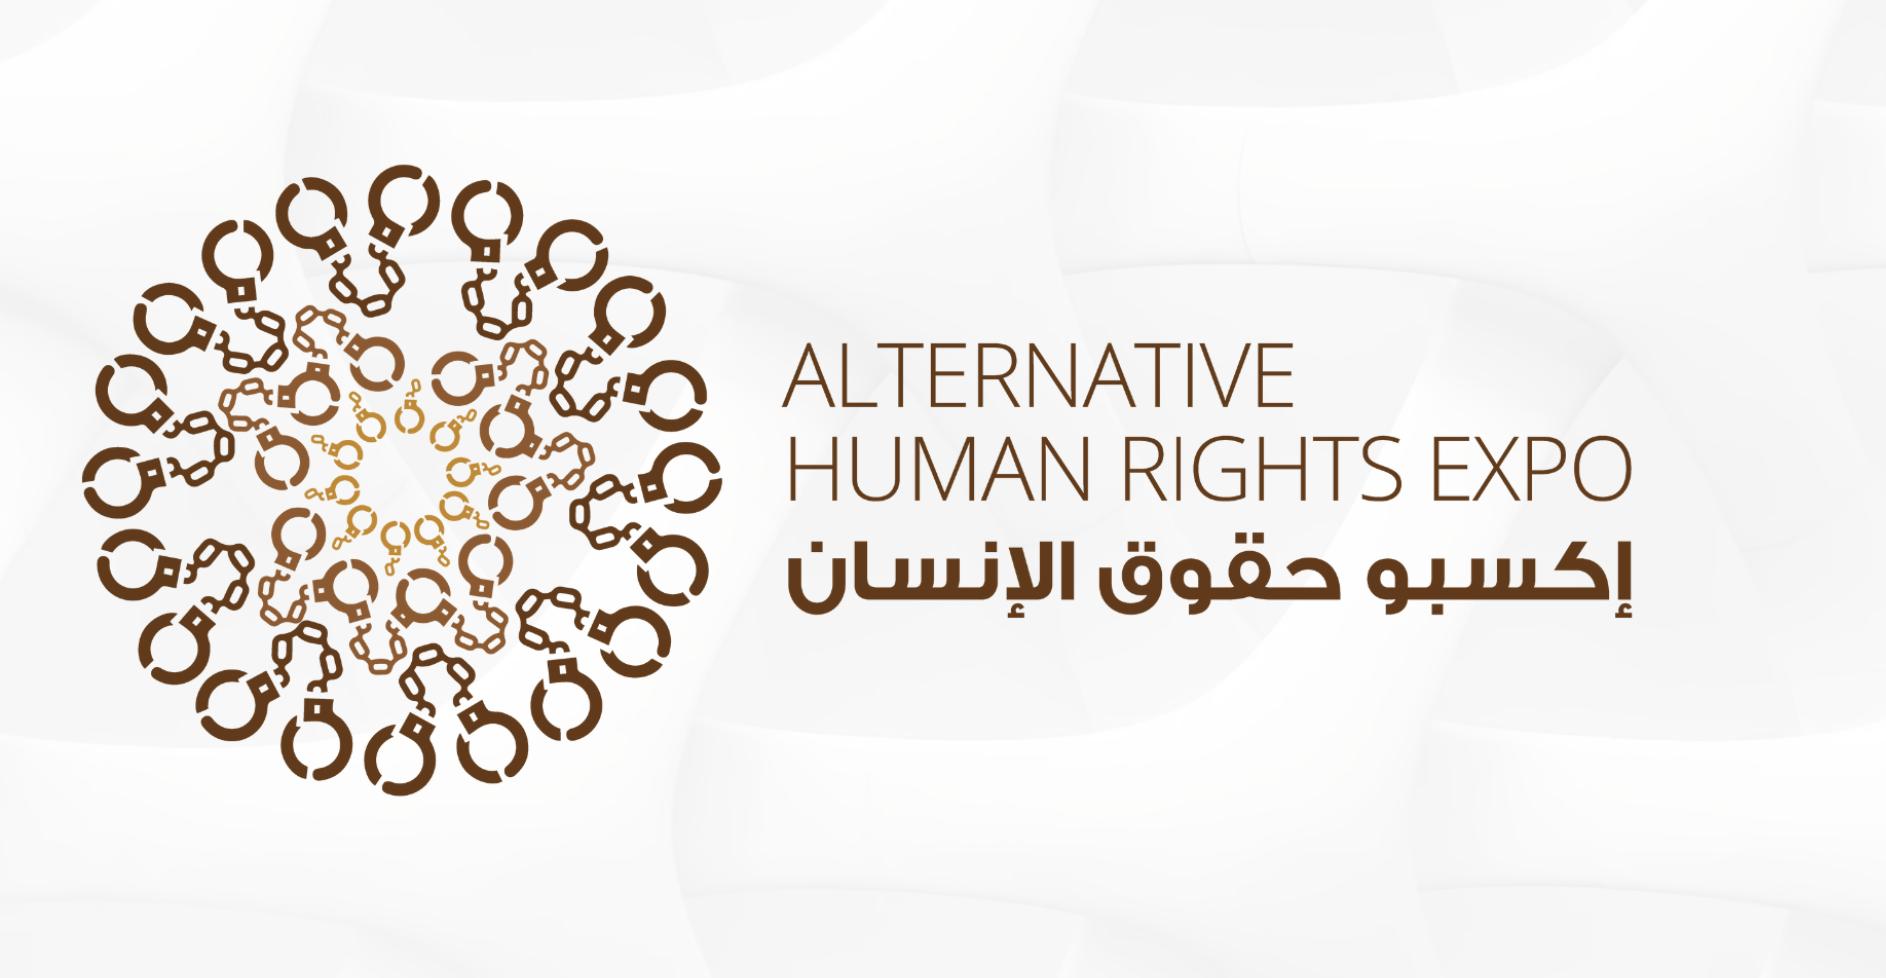 Logo of the Alternative Human Rights Expo